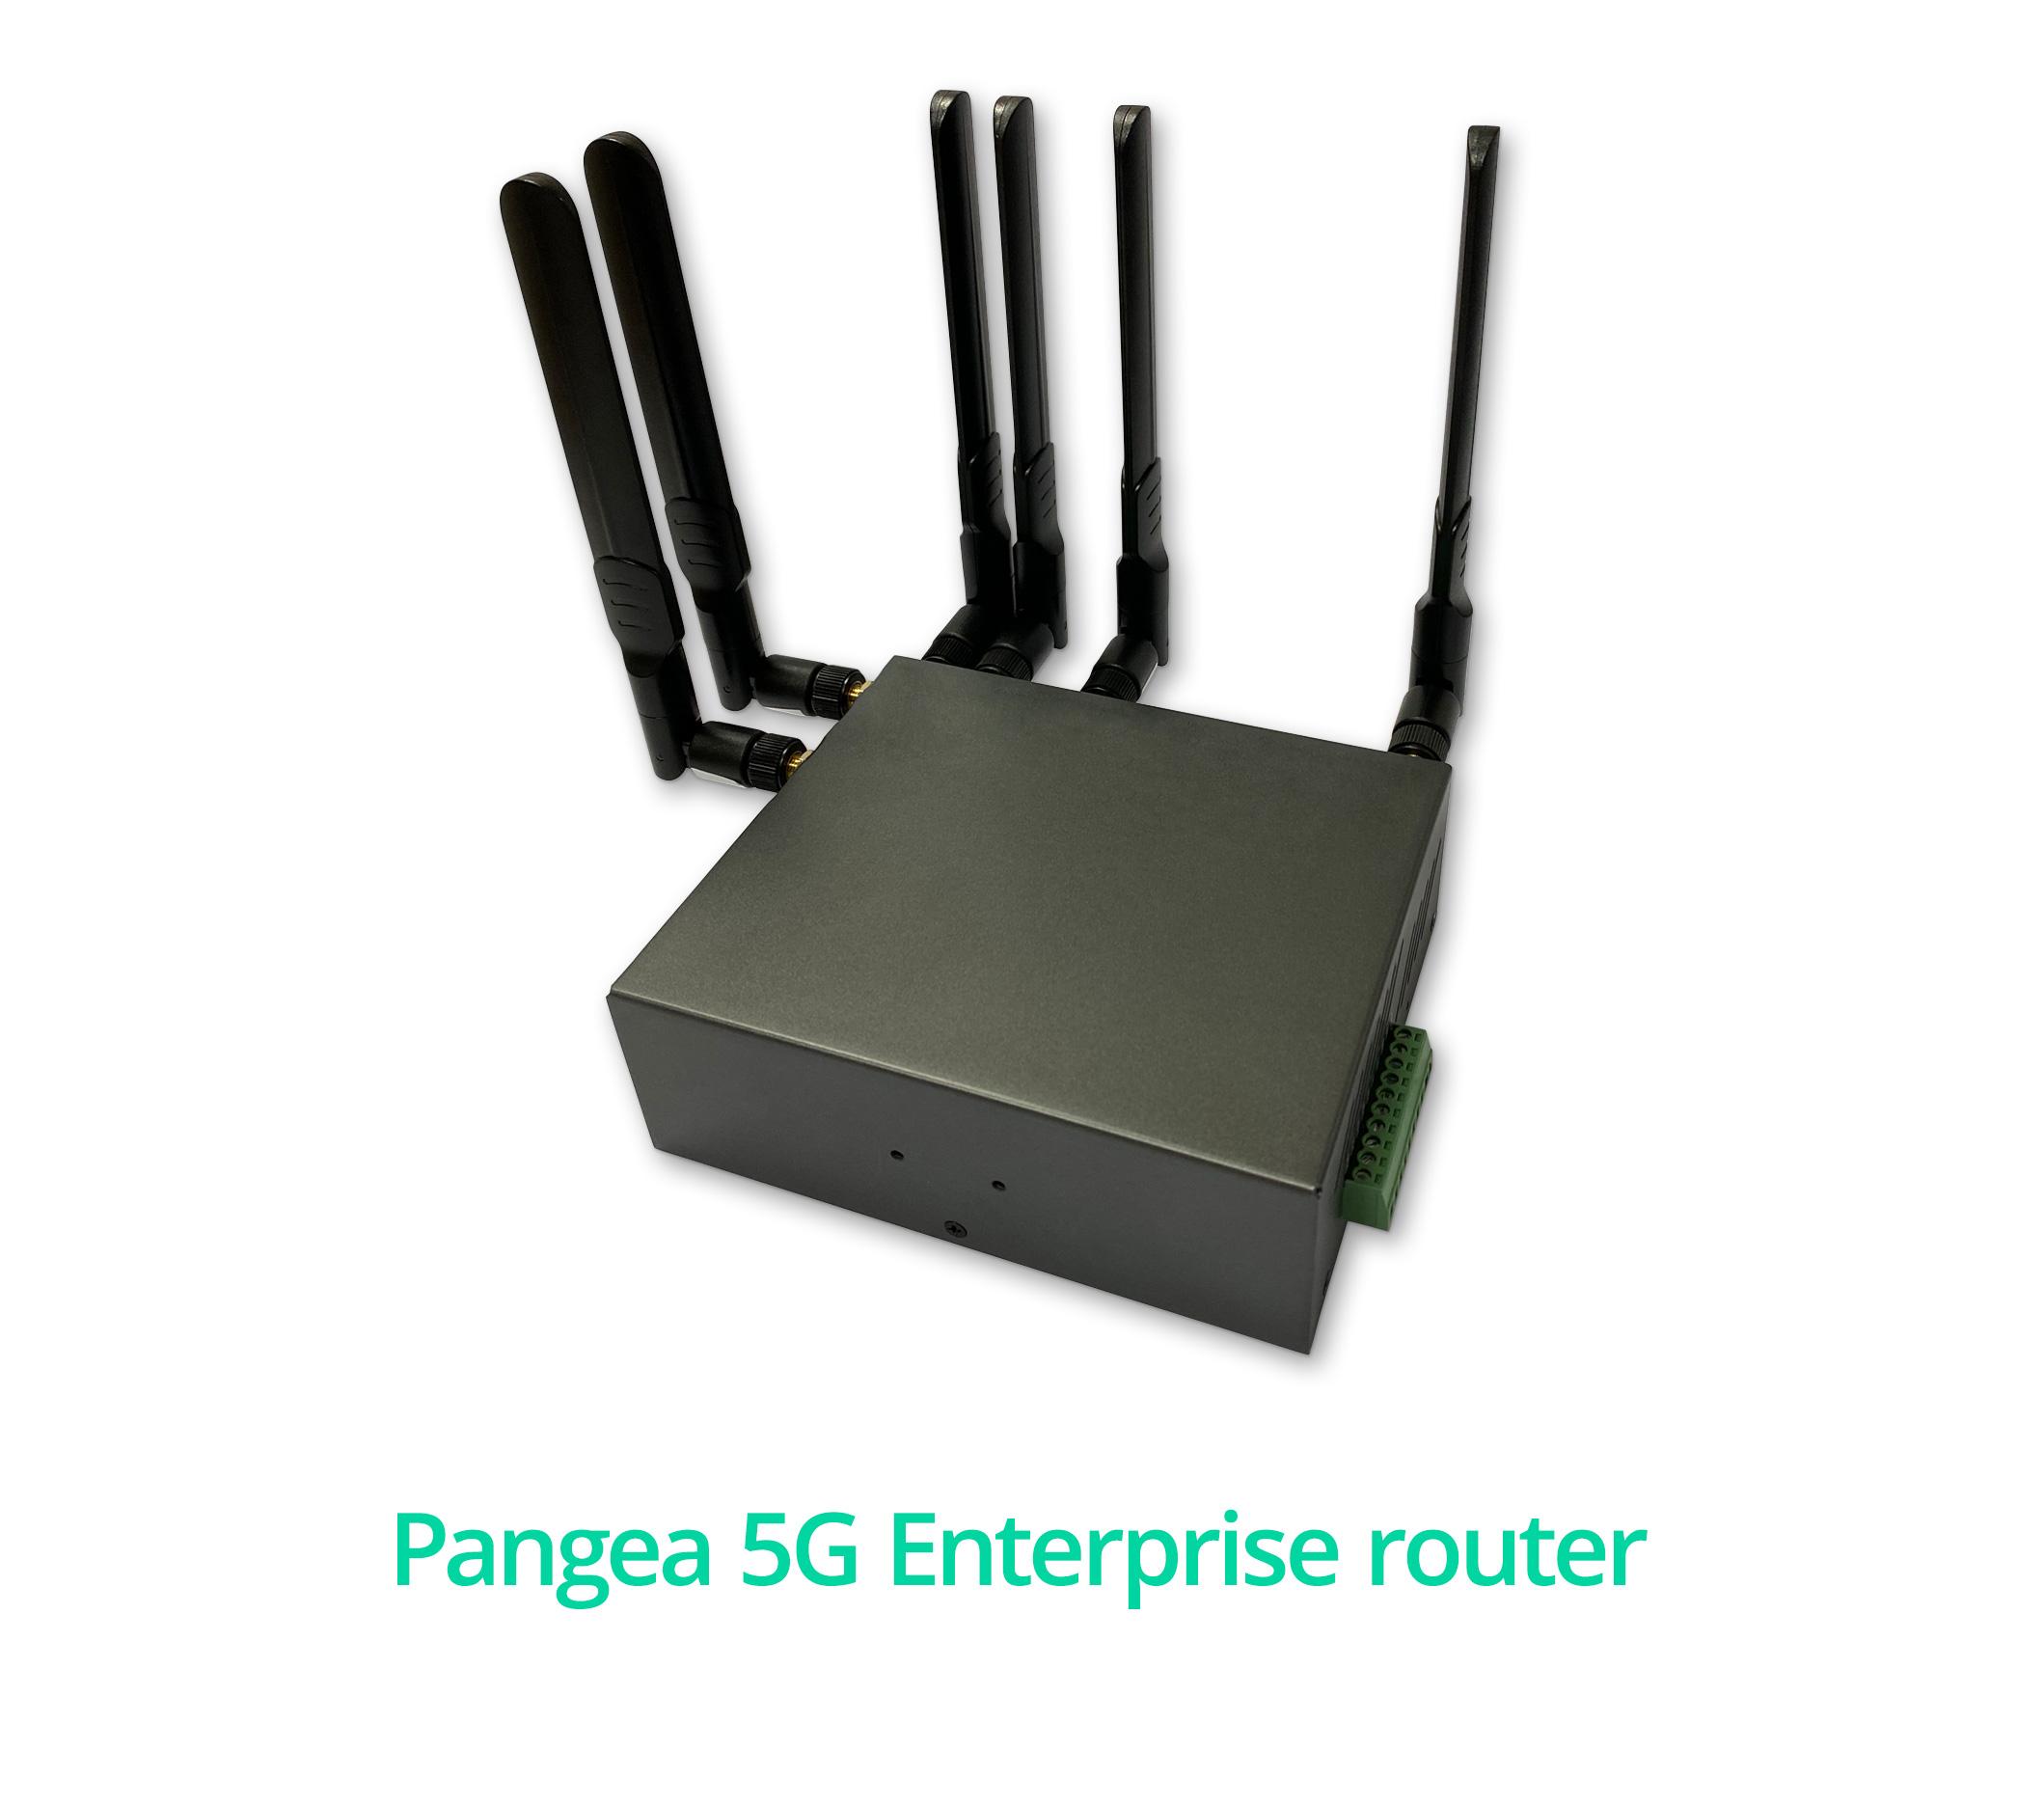 Pangea Soho router - Pangea 5G connectivity Enterprise router link